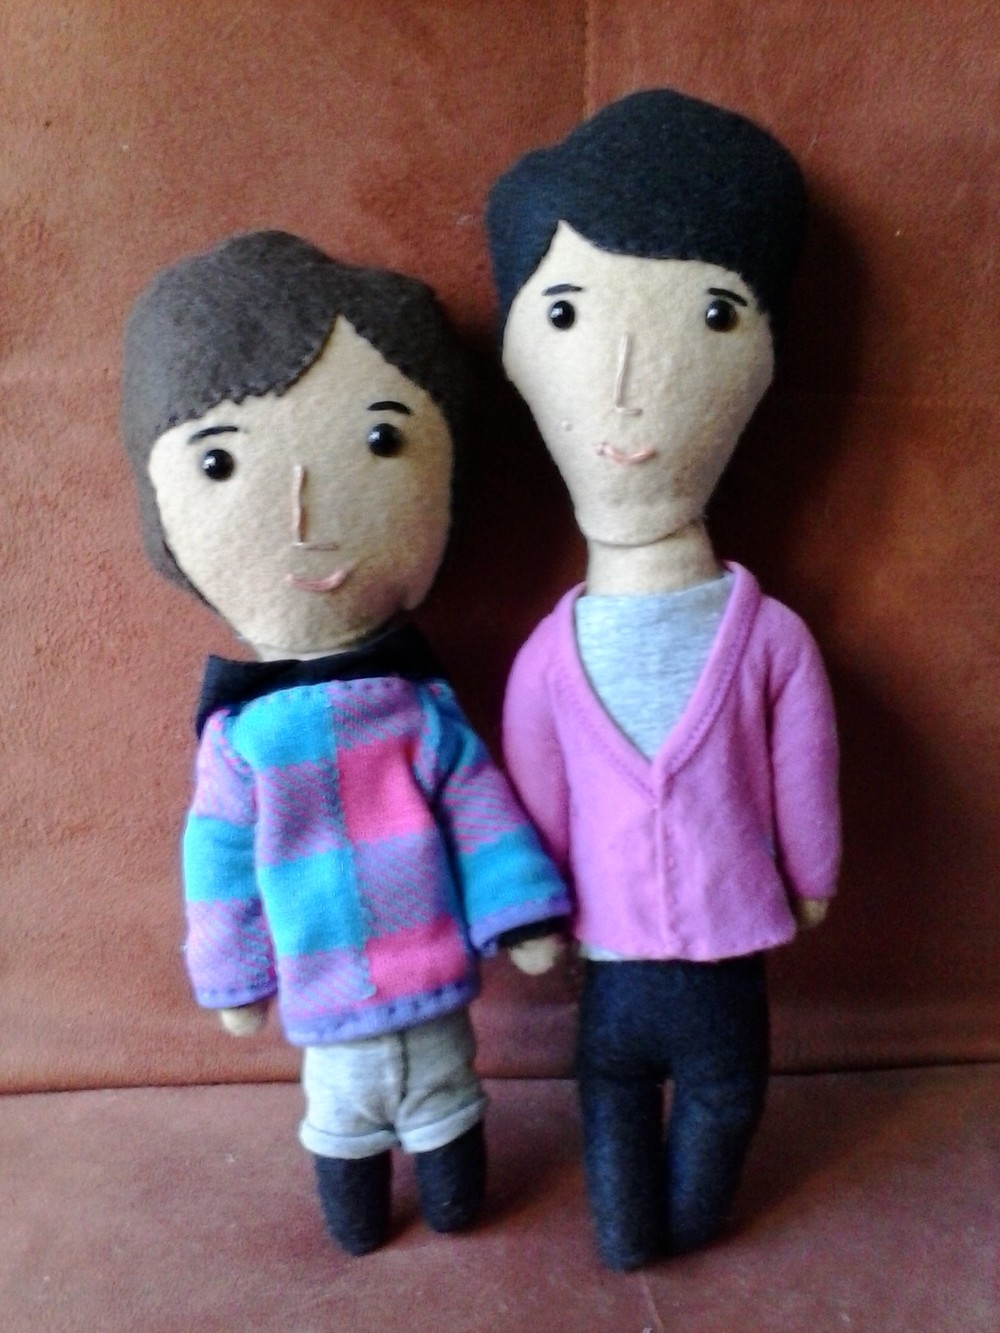 Secret Garden dolls